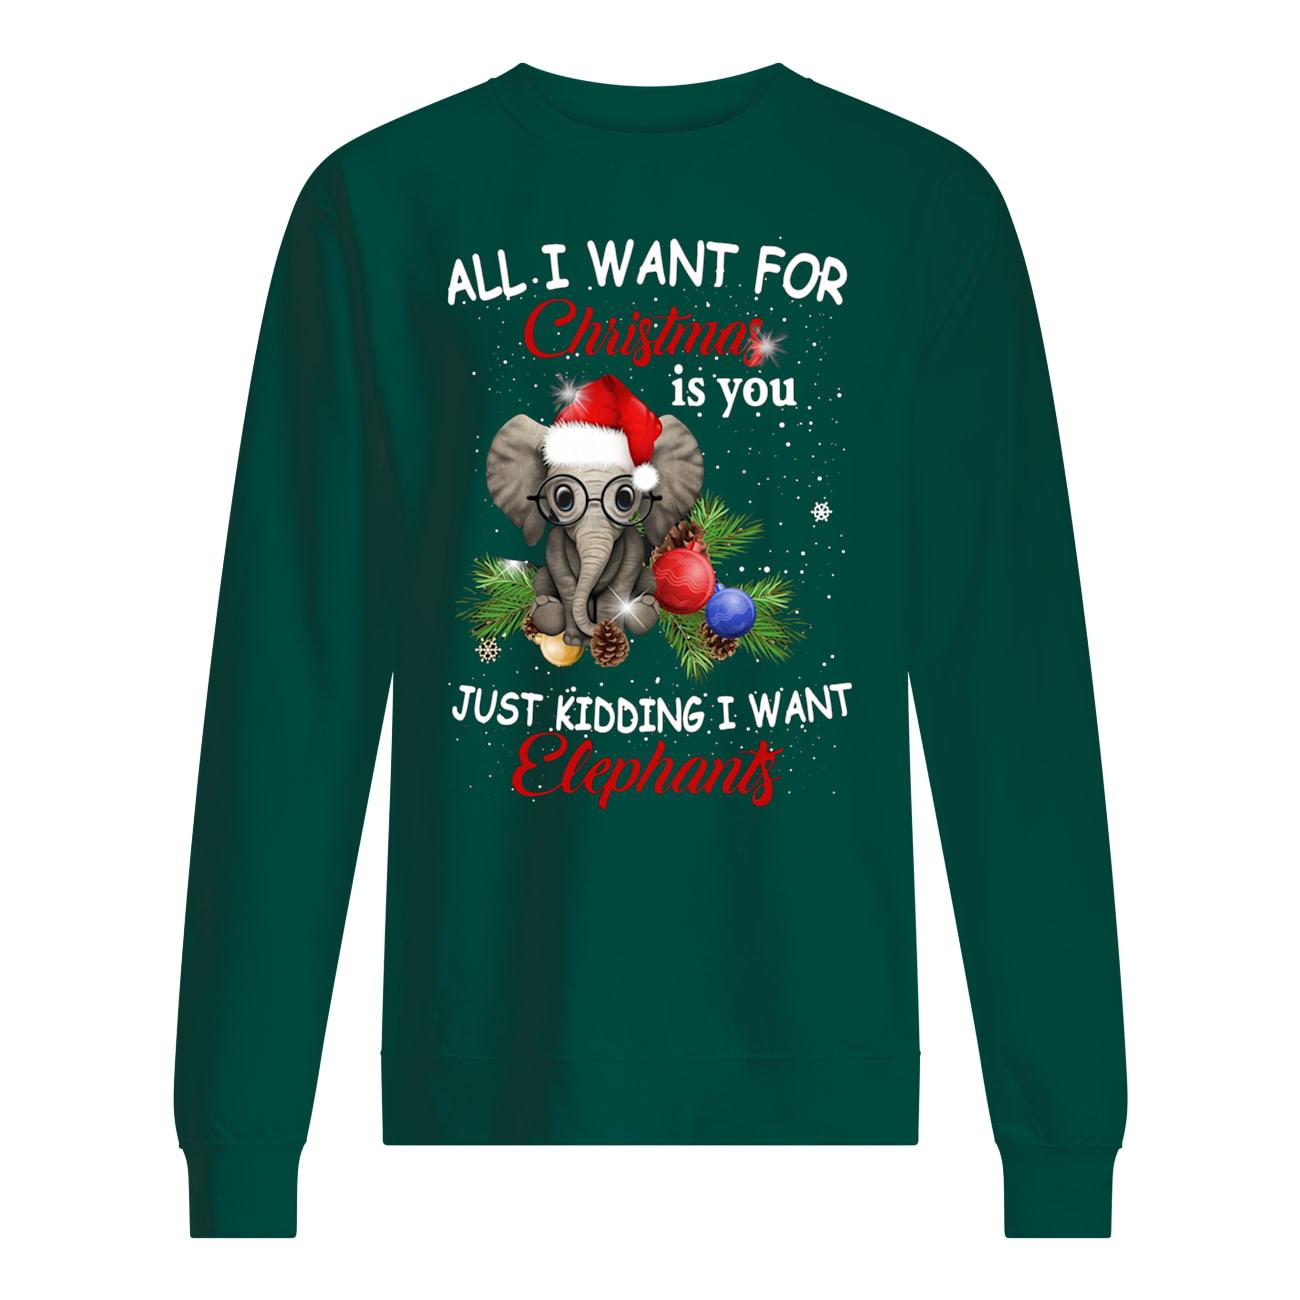 All i want for christmas is you just kidding i want elephant sweatshirt